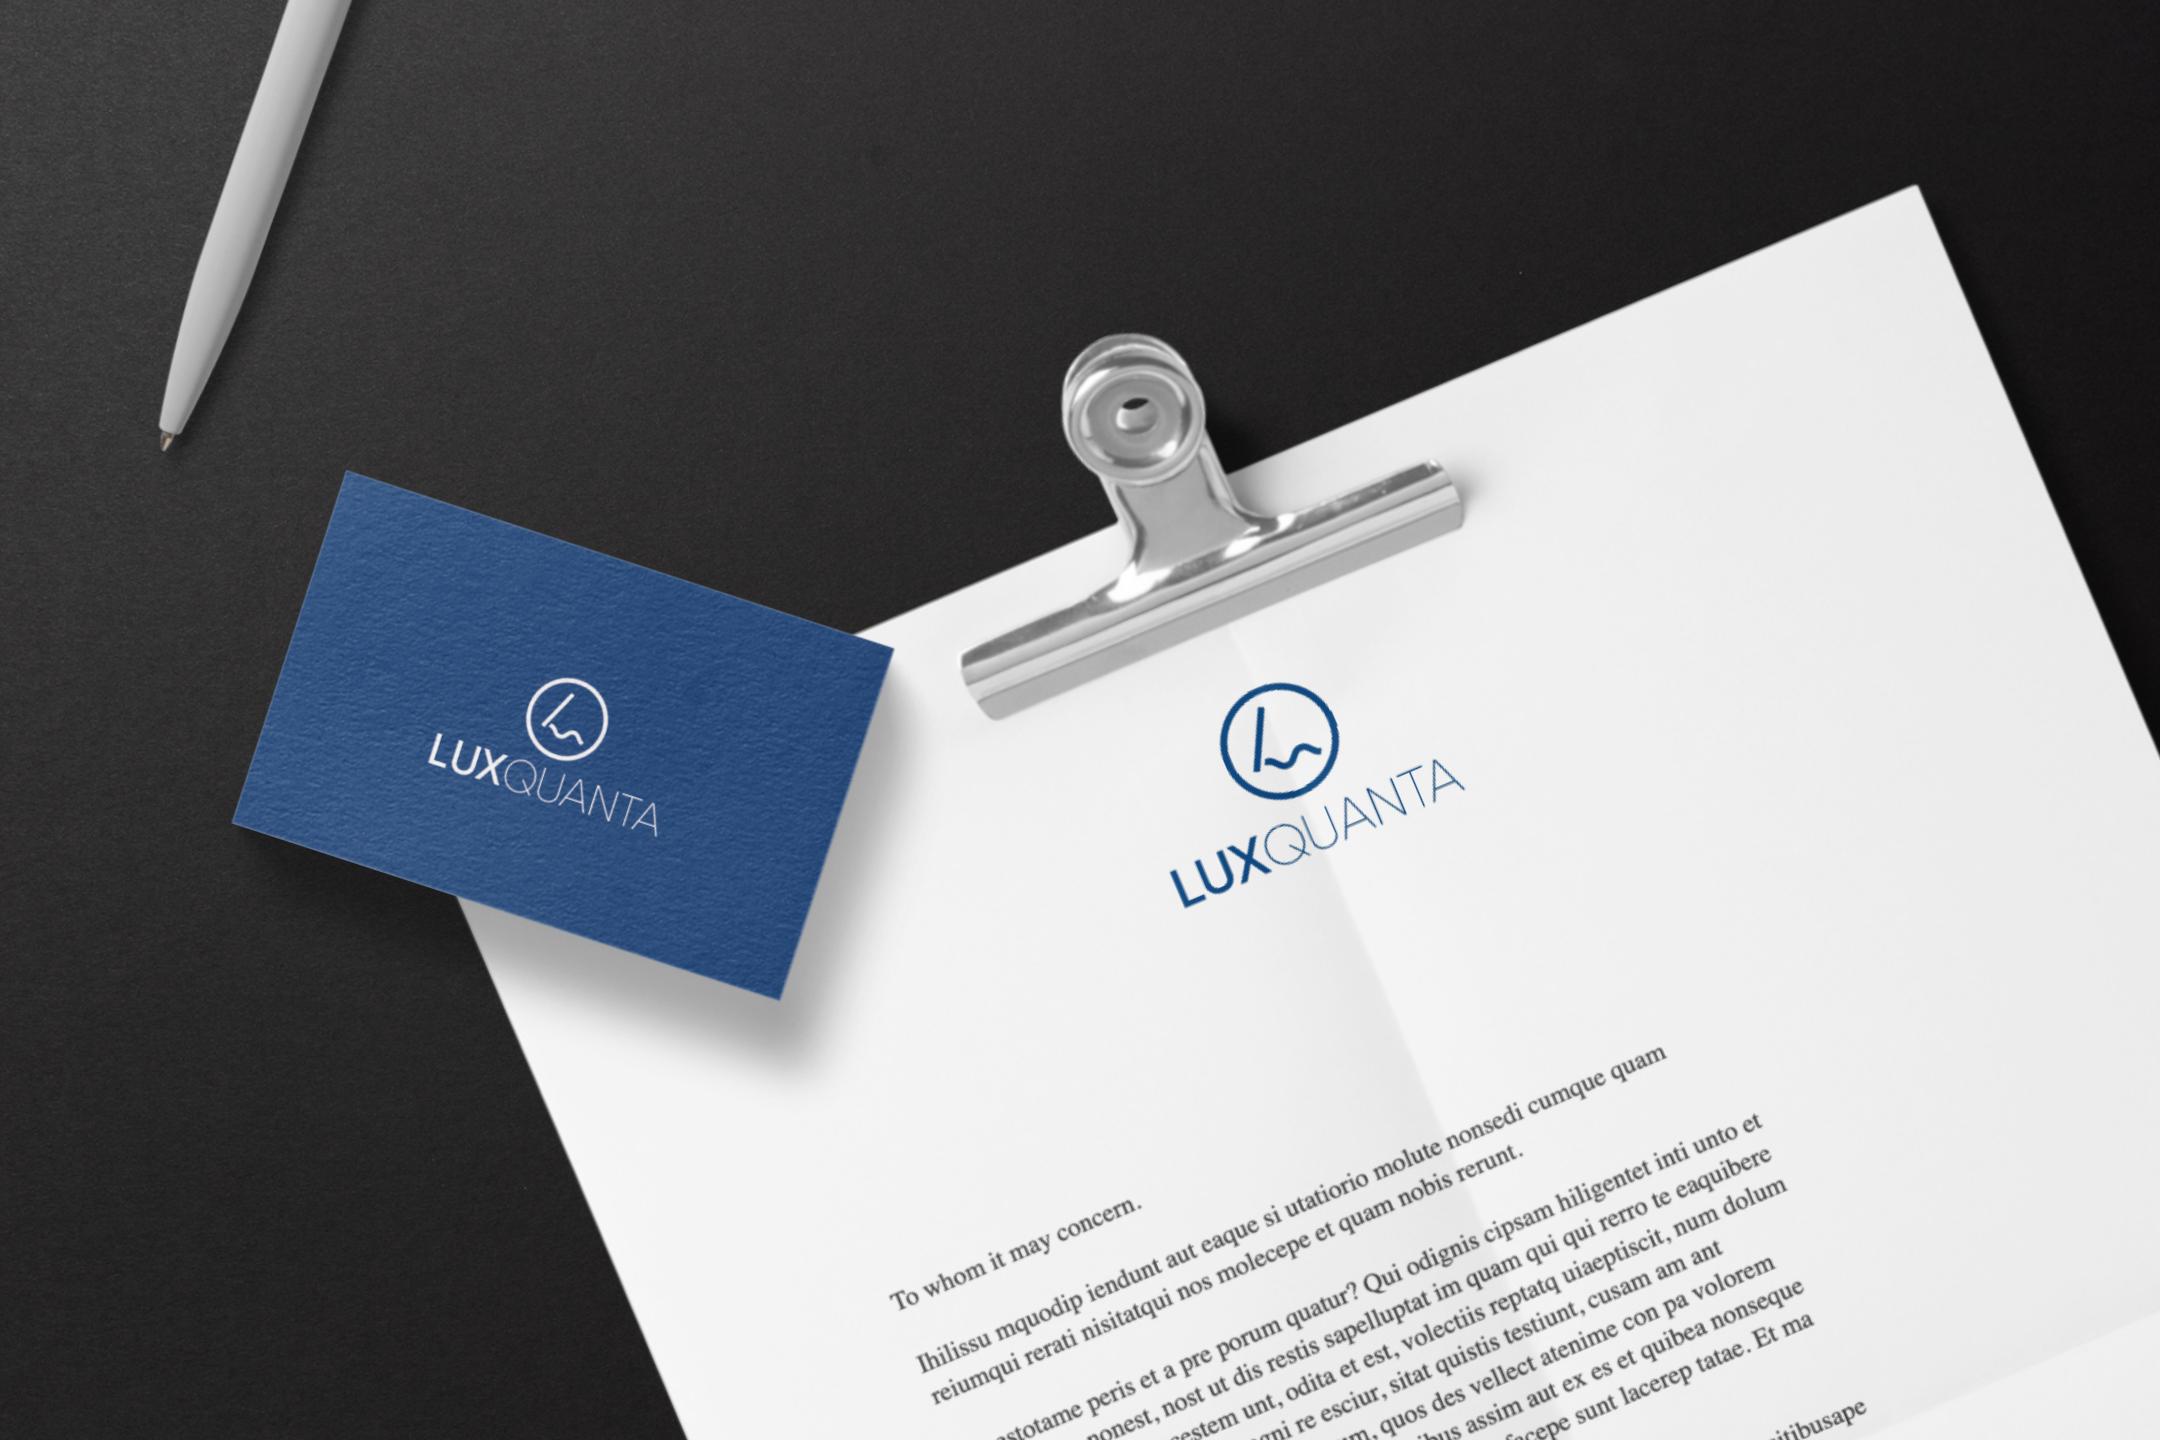 LuxQuanta-logo-design-business-card-letterhead